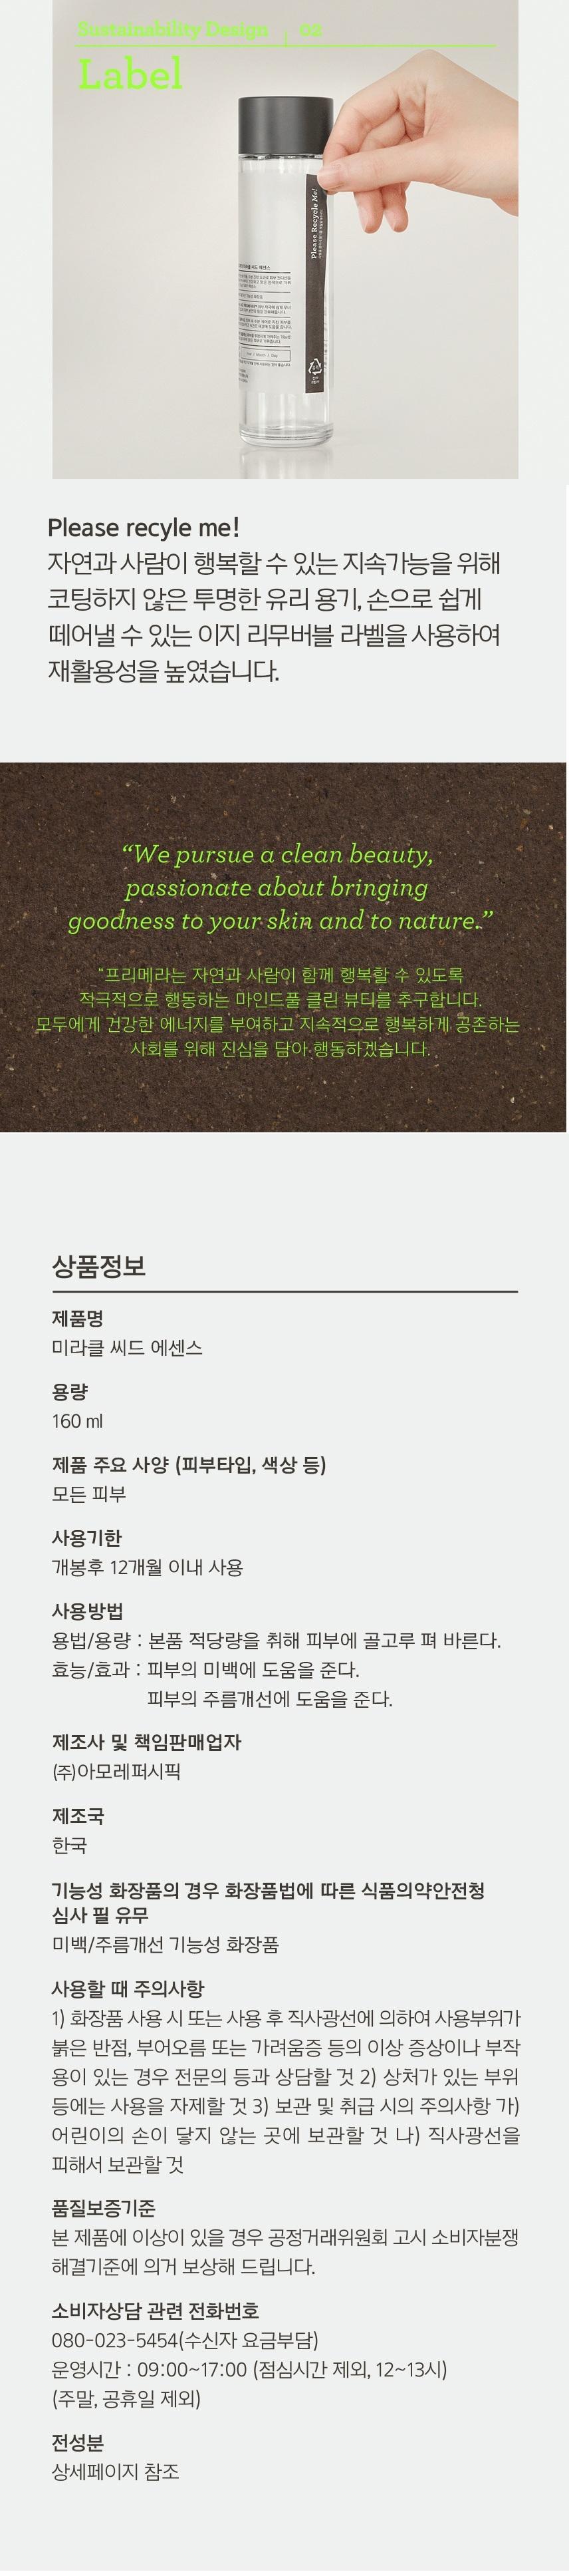 primera Miracle Seed Essence 230ml korean skincare prduct online shop malaysia sweden macau8